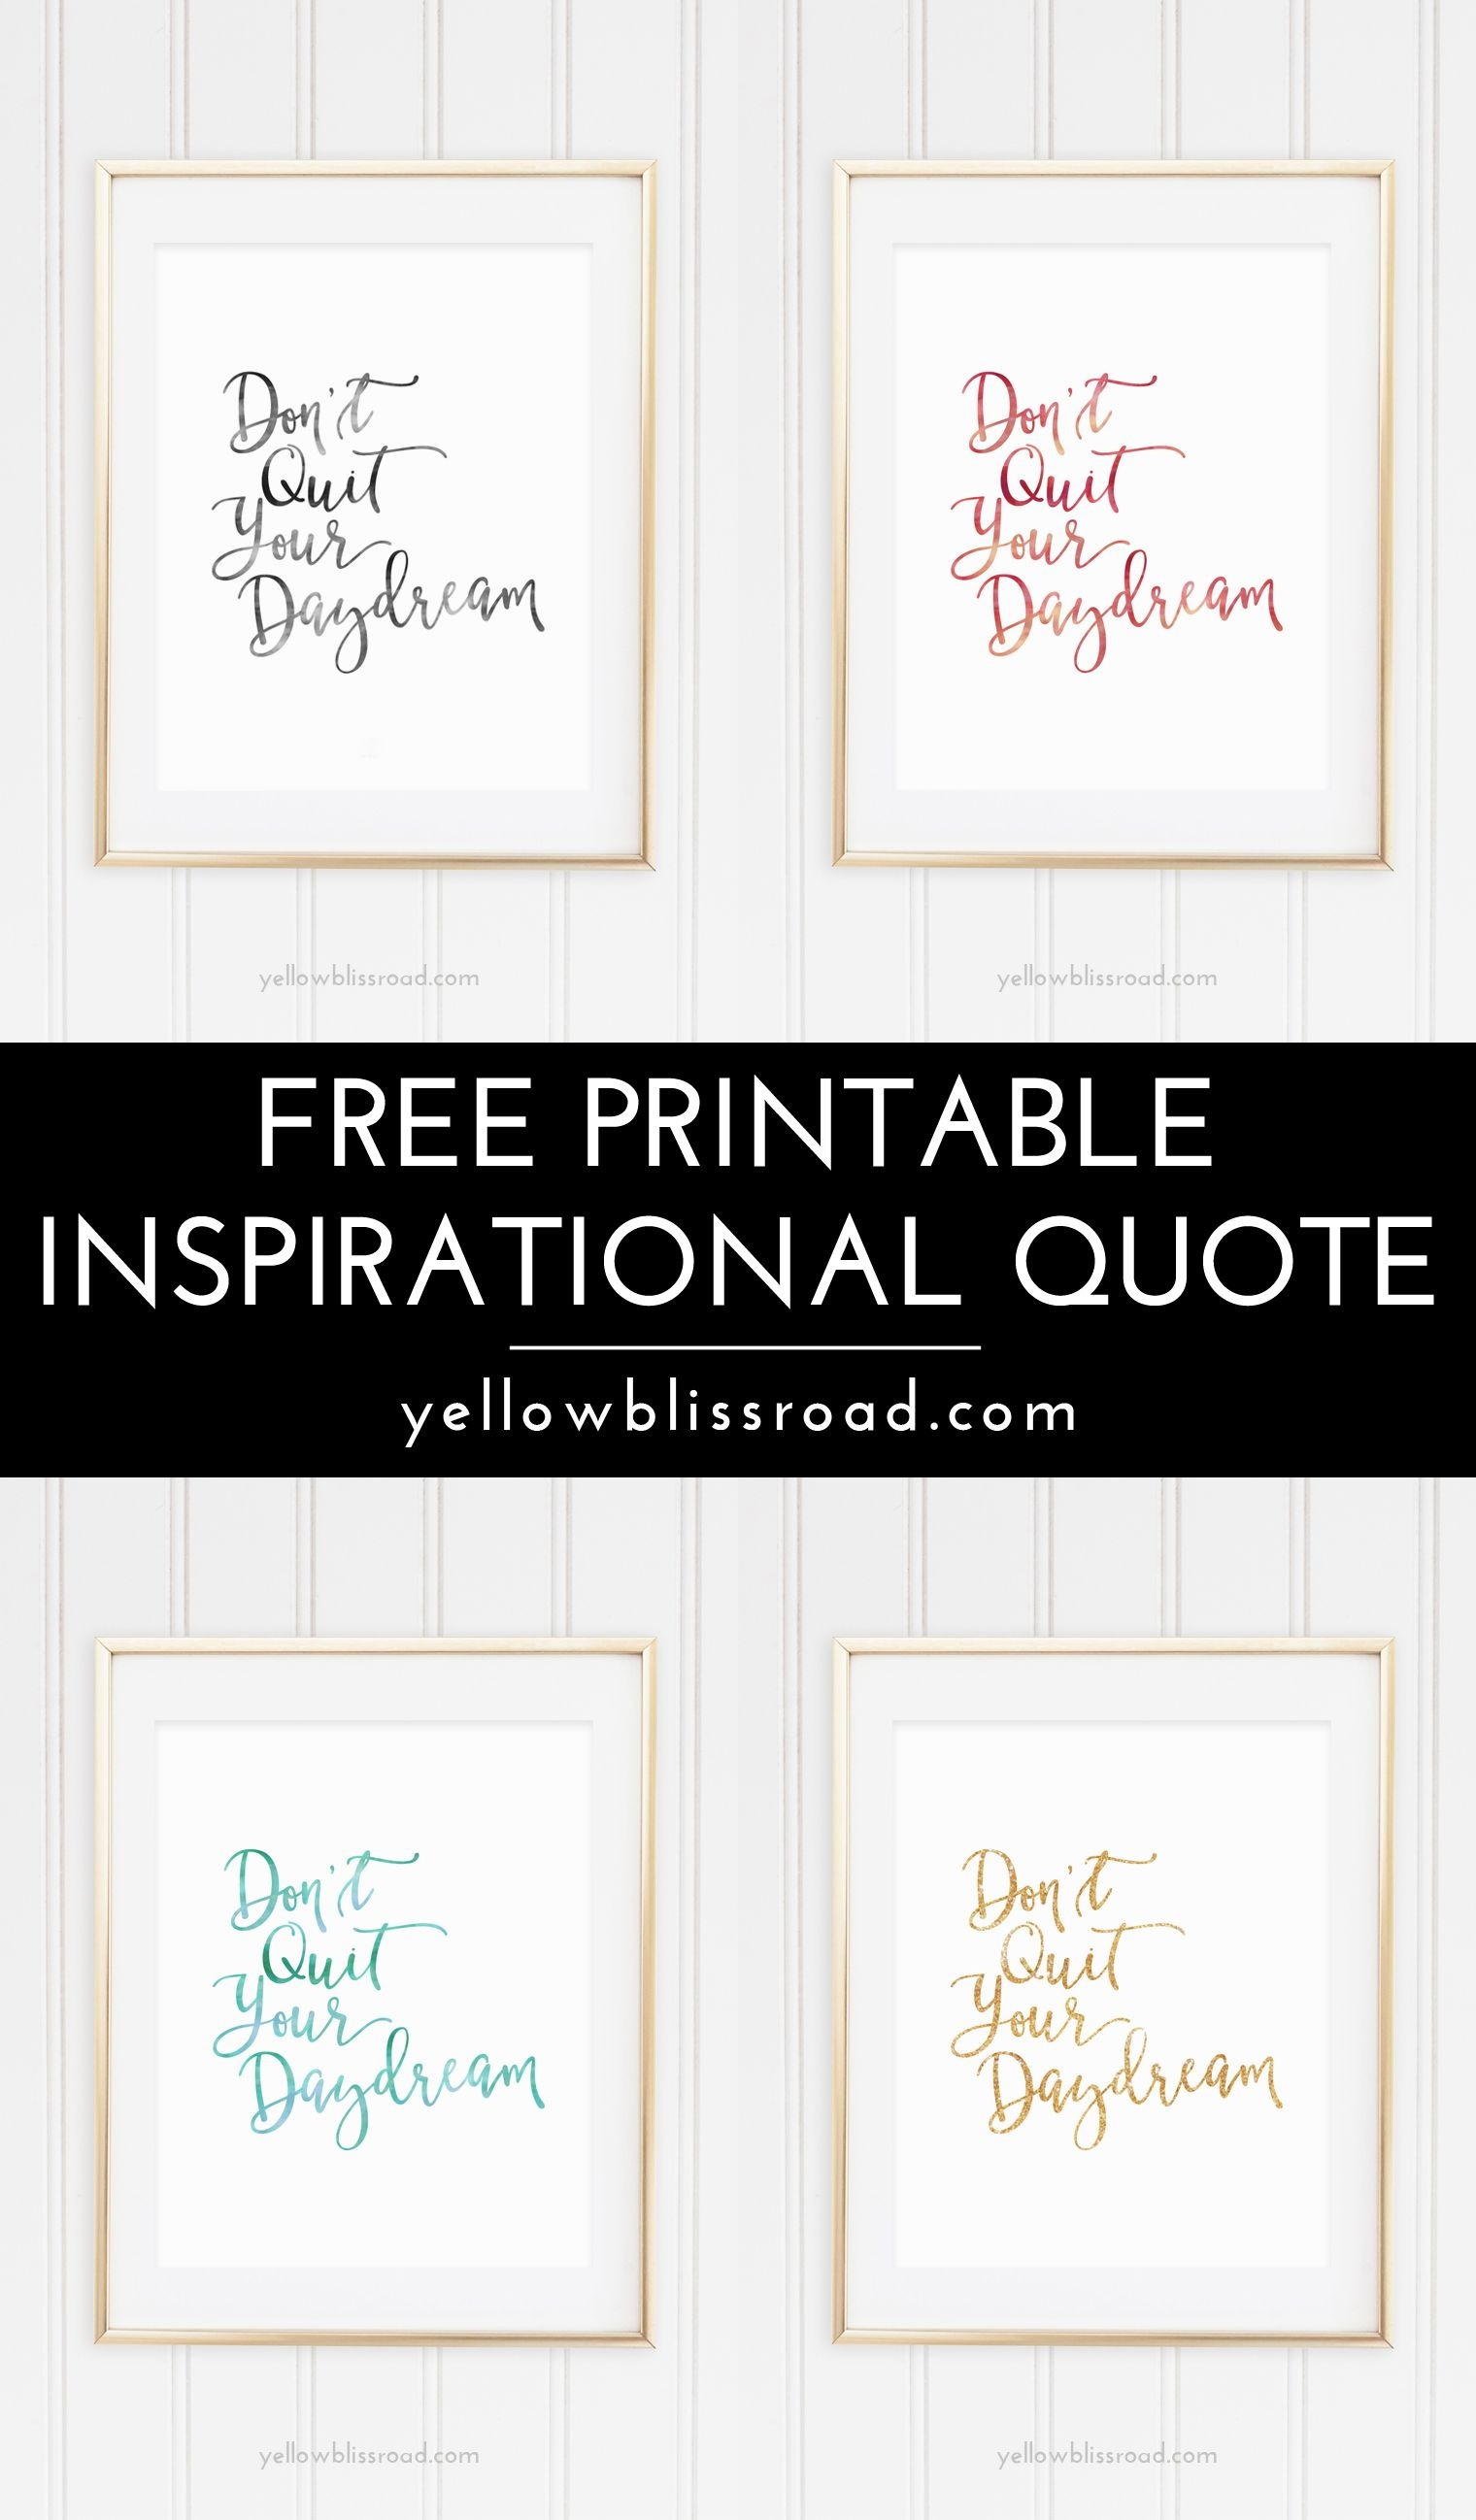 Free Inspiration Quote Printable | Free Printable Wall Art, Quotes - Free Printable Wall Art Quotes